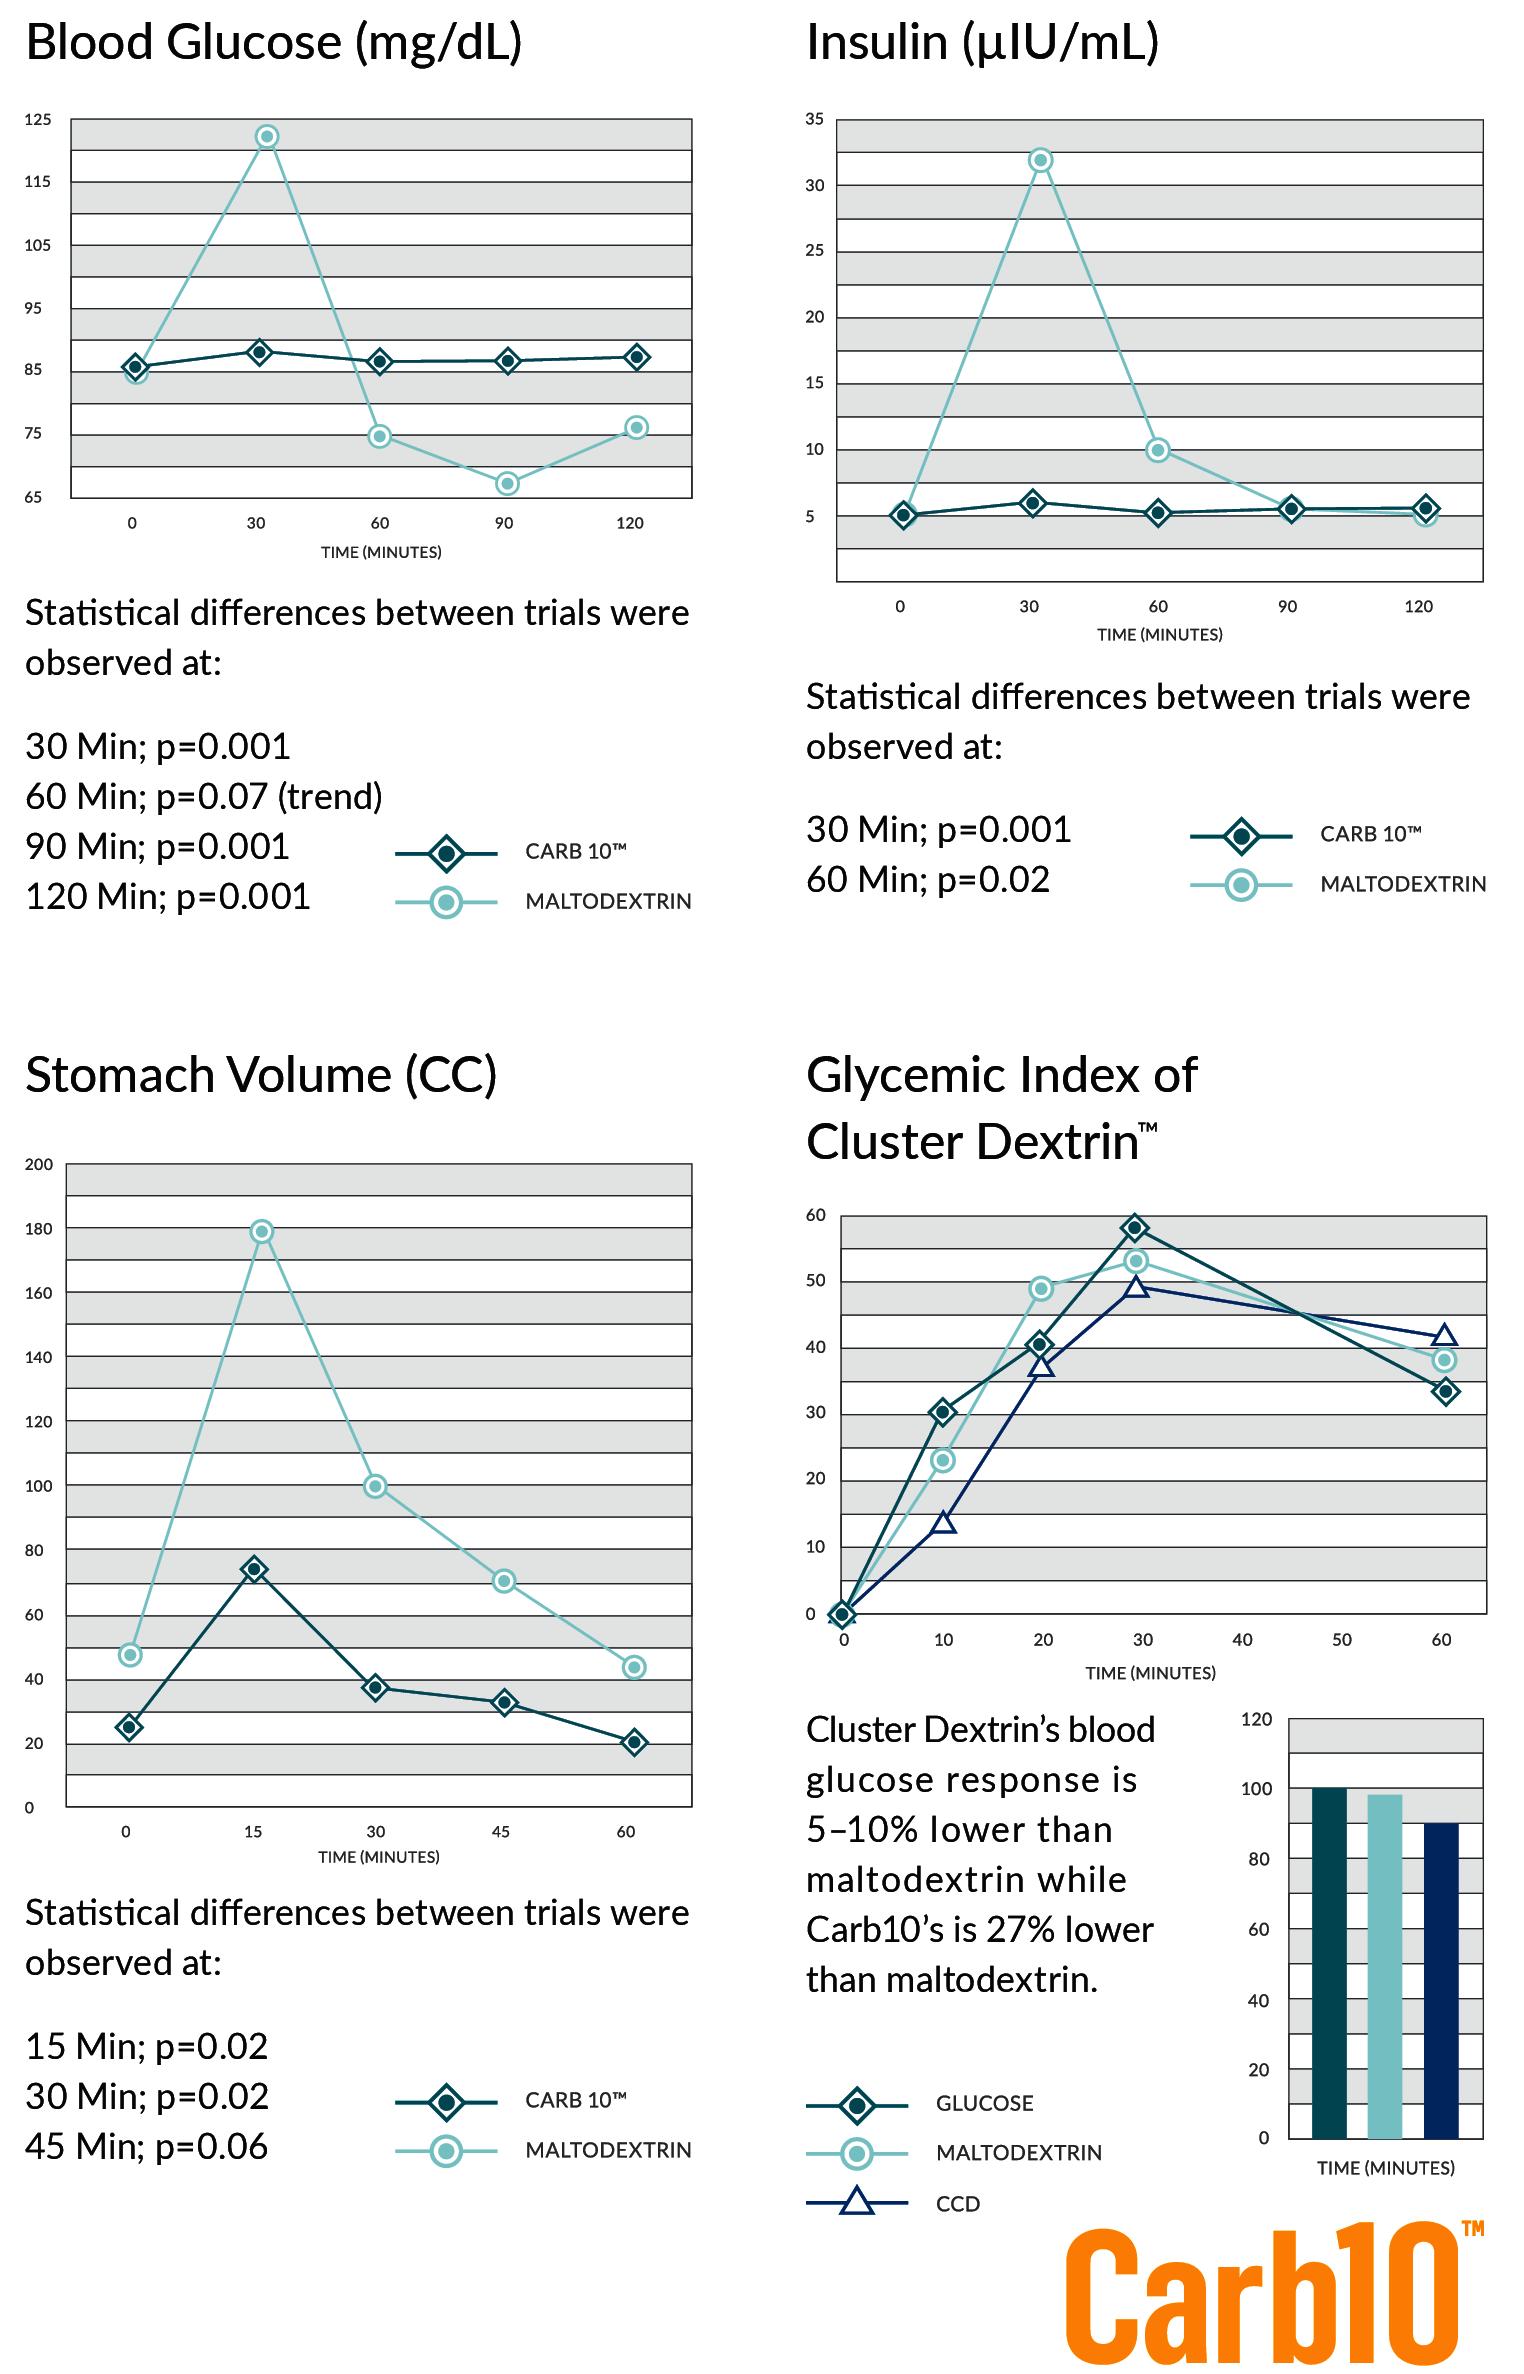 Carb10 vs Maltodextrin and Glucose vs. Maltodextrin vs. Cluster Dextrin (bottom-right)